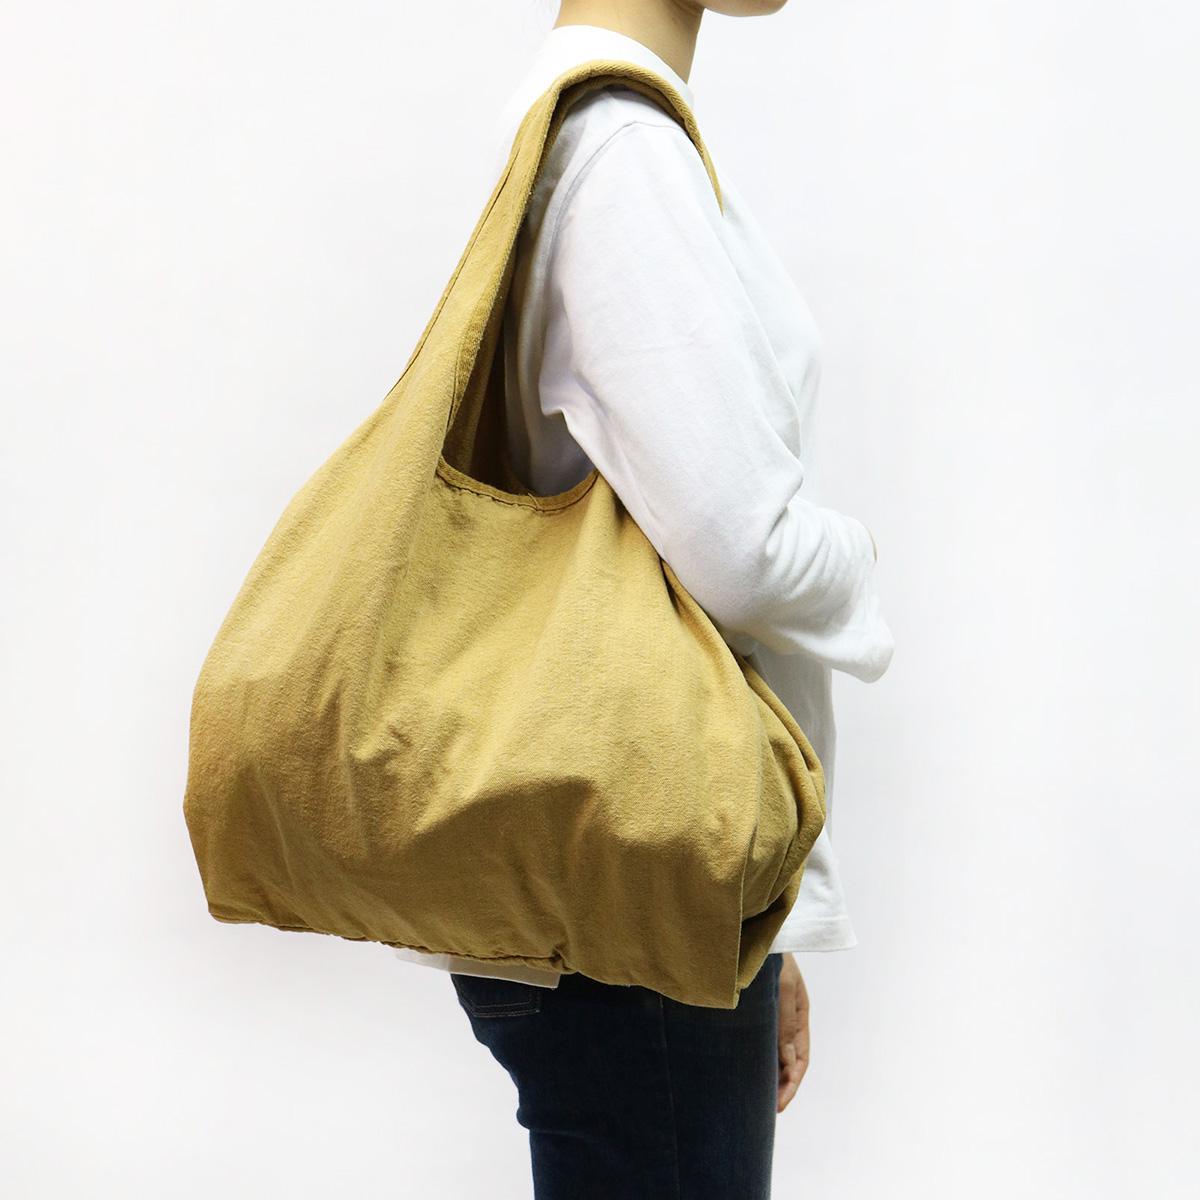 【MAKEUP】倉敷帆布 製品染め エコバッグ LL 8カラー